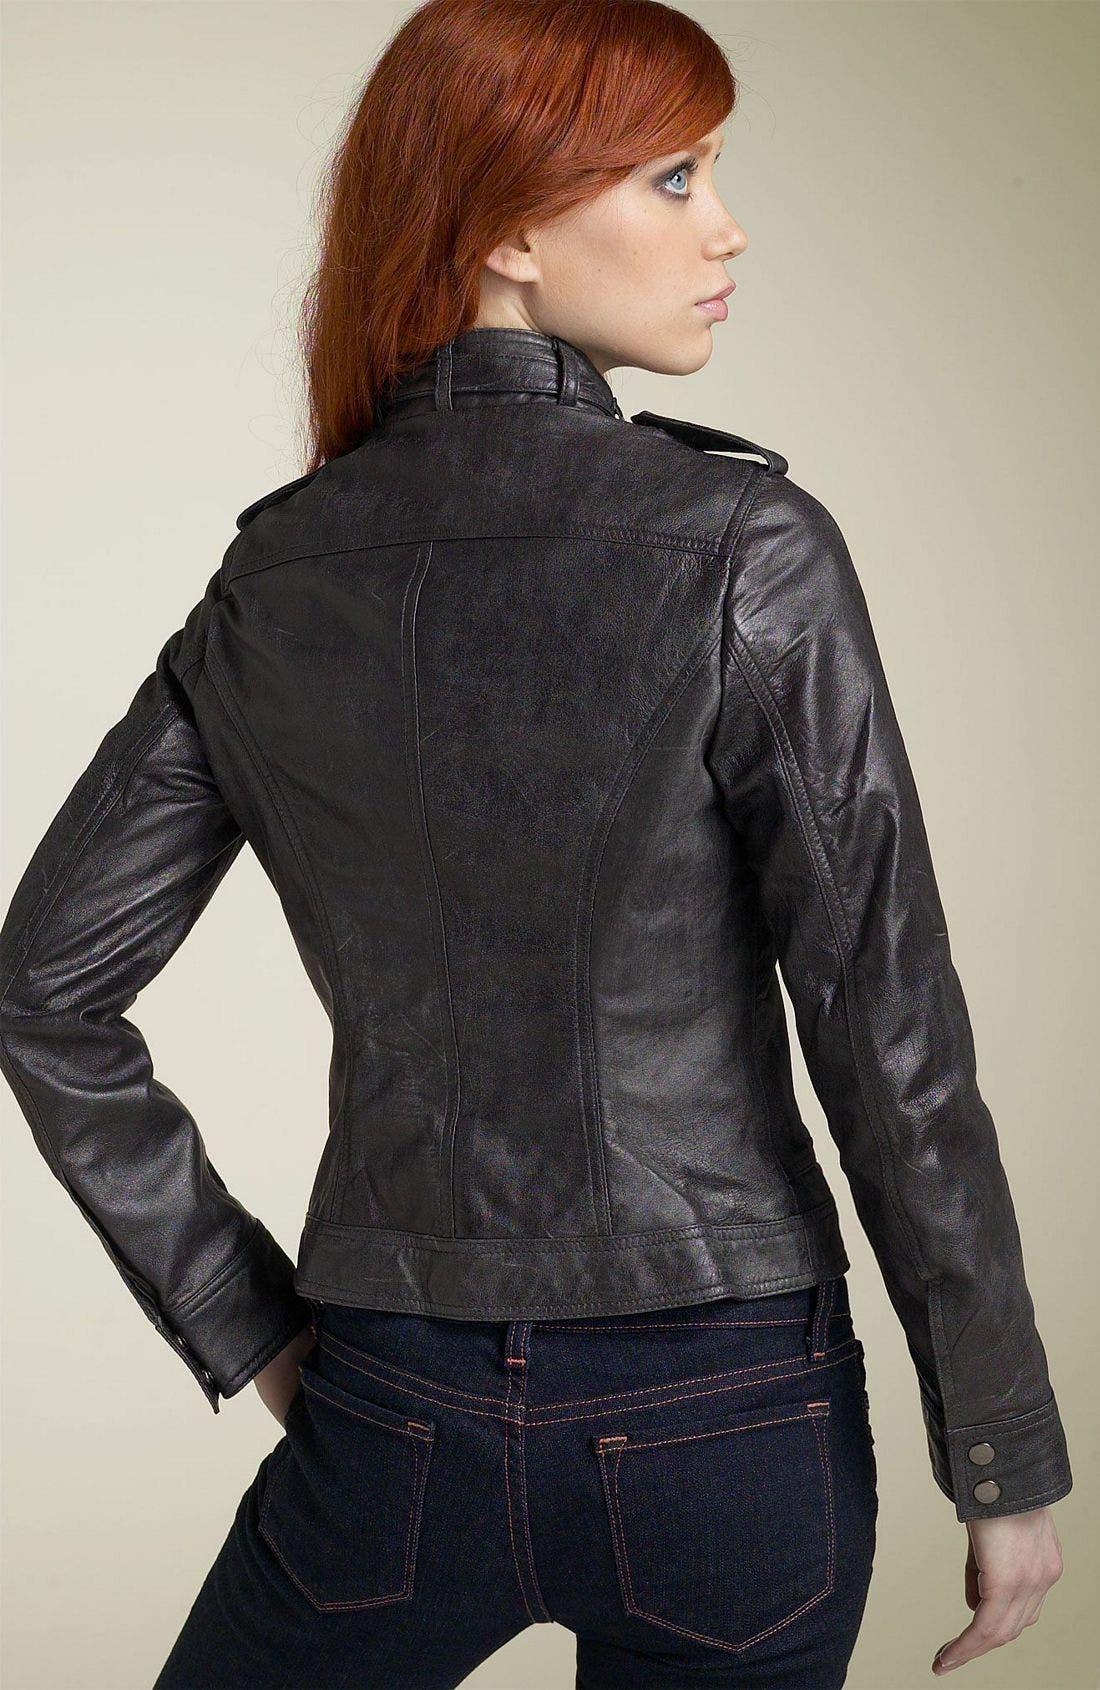 Kenna-T Motorcycle Jacket,                             Alternate thumbnail 2, color,                             Distressed Black